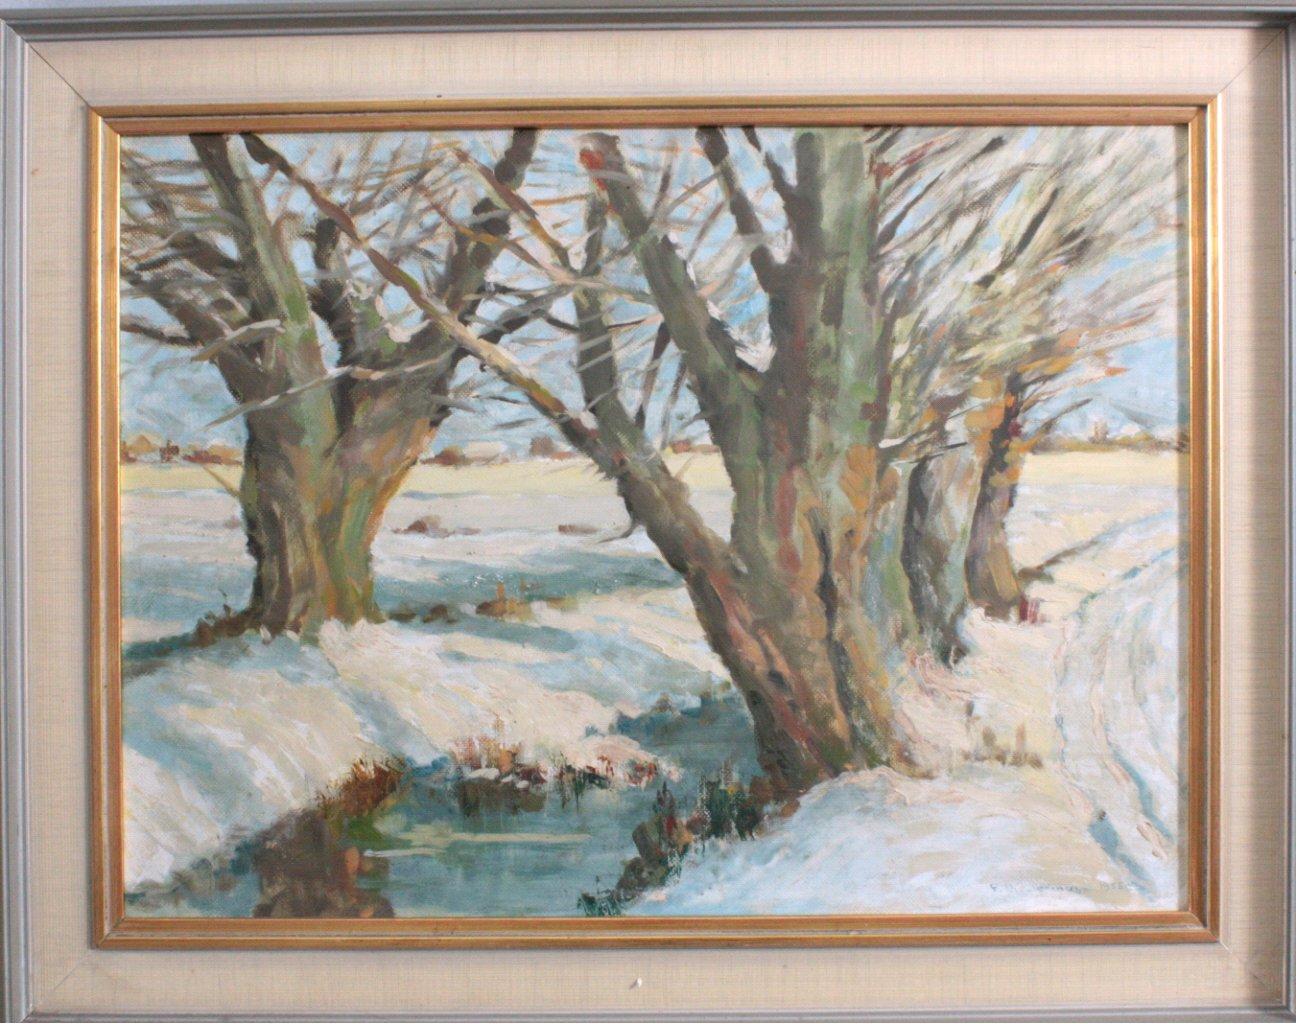 F. Biedermann, Winterlandschaft